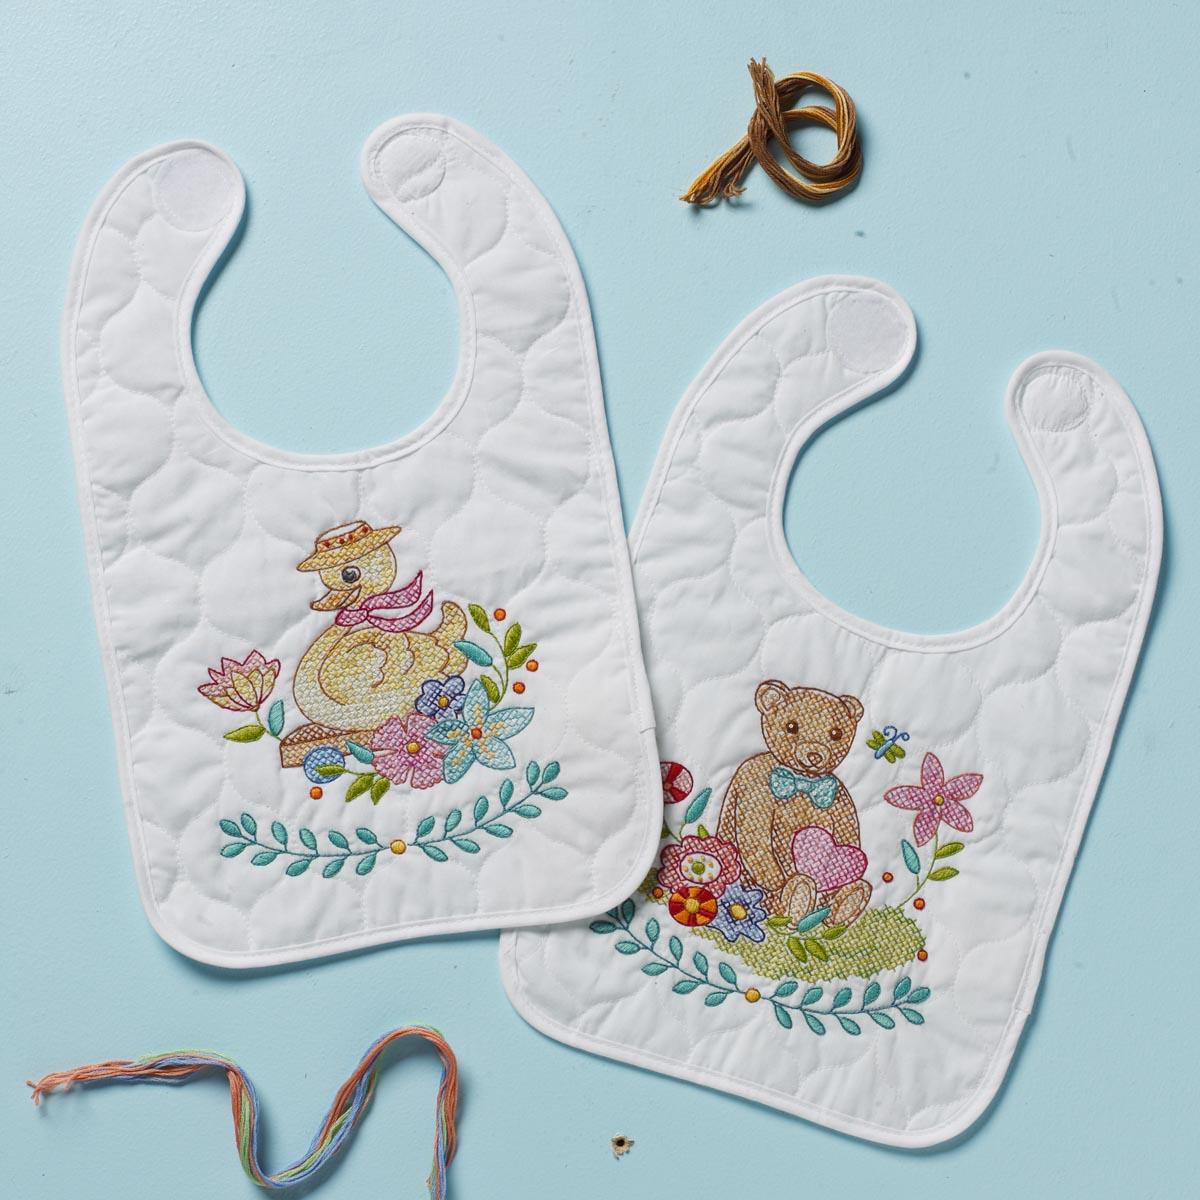 Bucilla ® Baby - Stamped Cross Stitch - Crib Ensembles - Sweet Baby - Bib Pair Kit